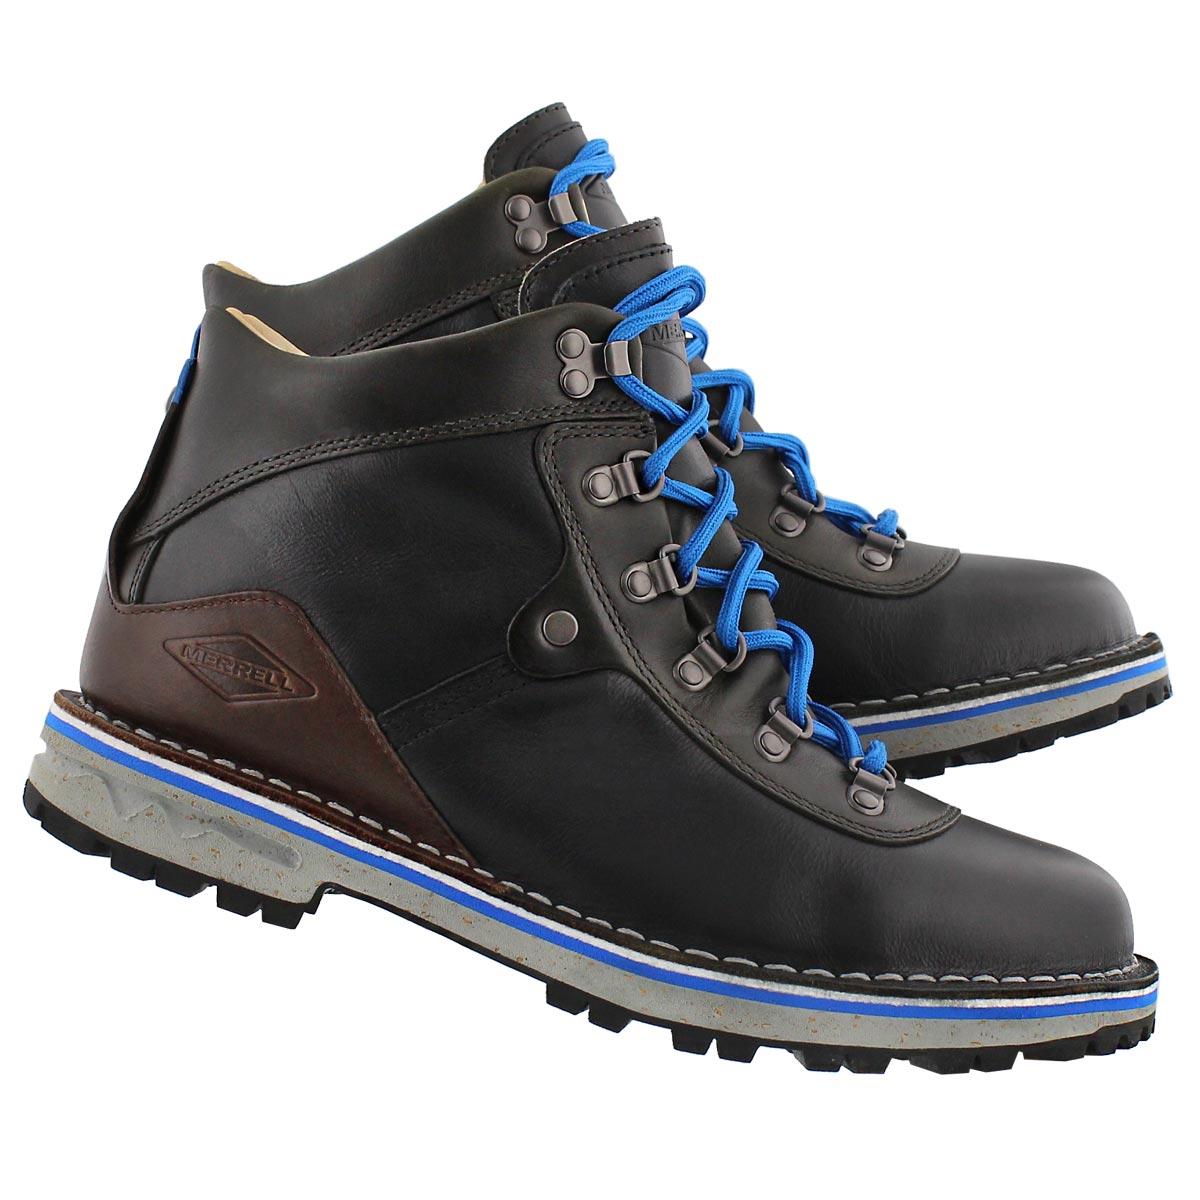 Lds Sugarbush black wtpf hiking boot